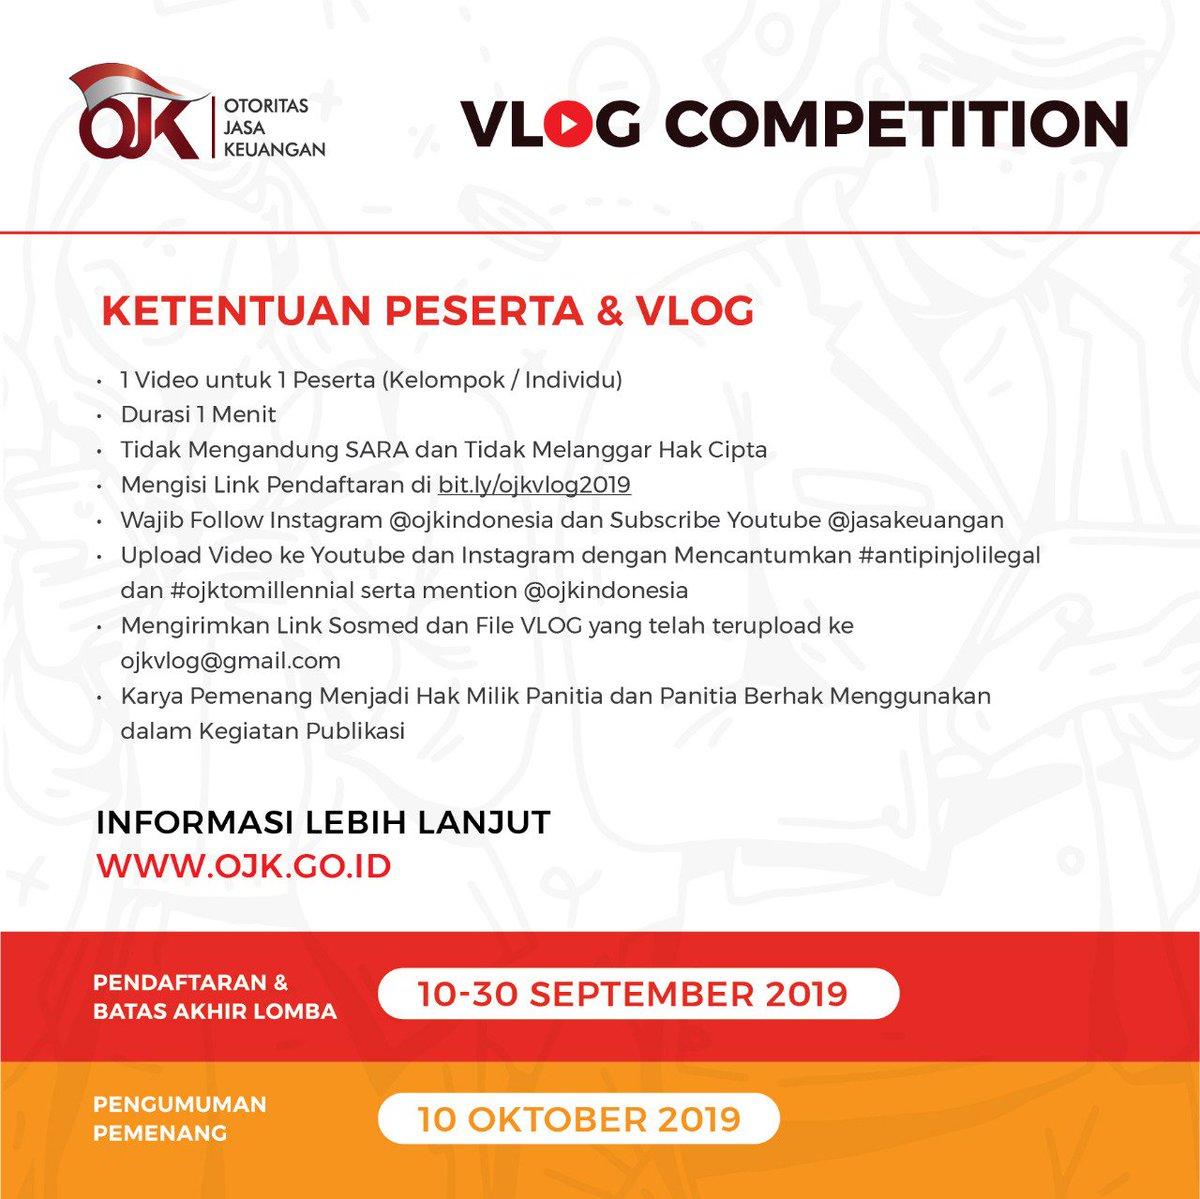 Ojk Indonesia On Twitter Ojktomillennial Halo Sobat Ojk Untuk